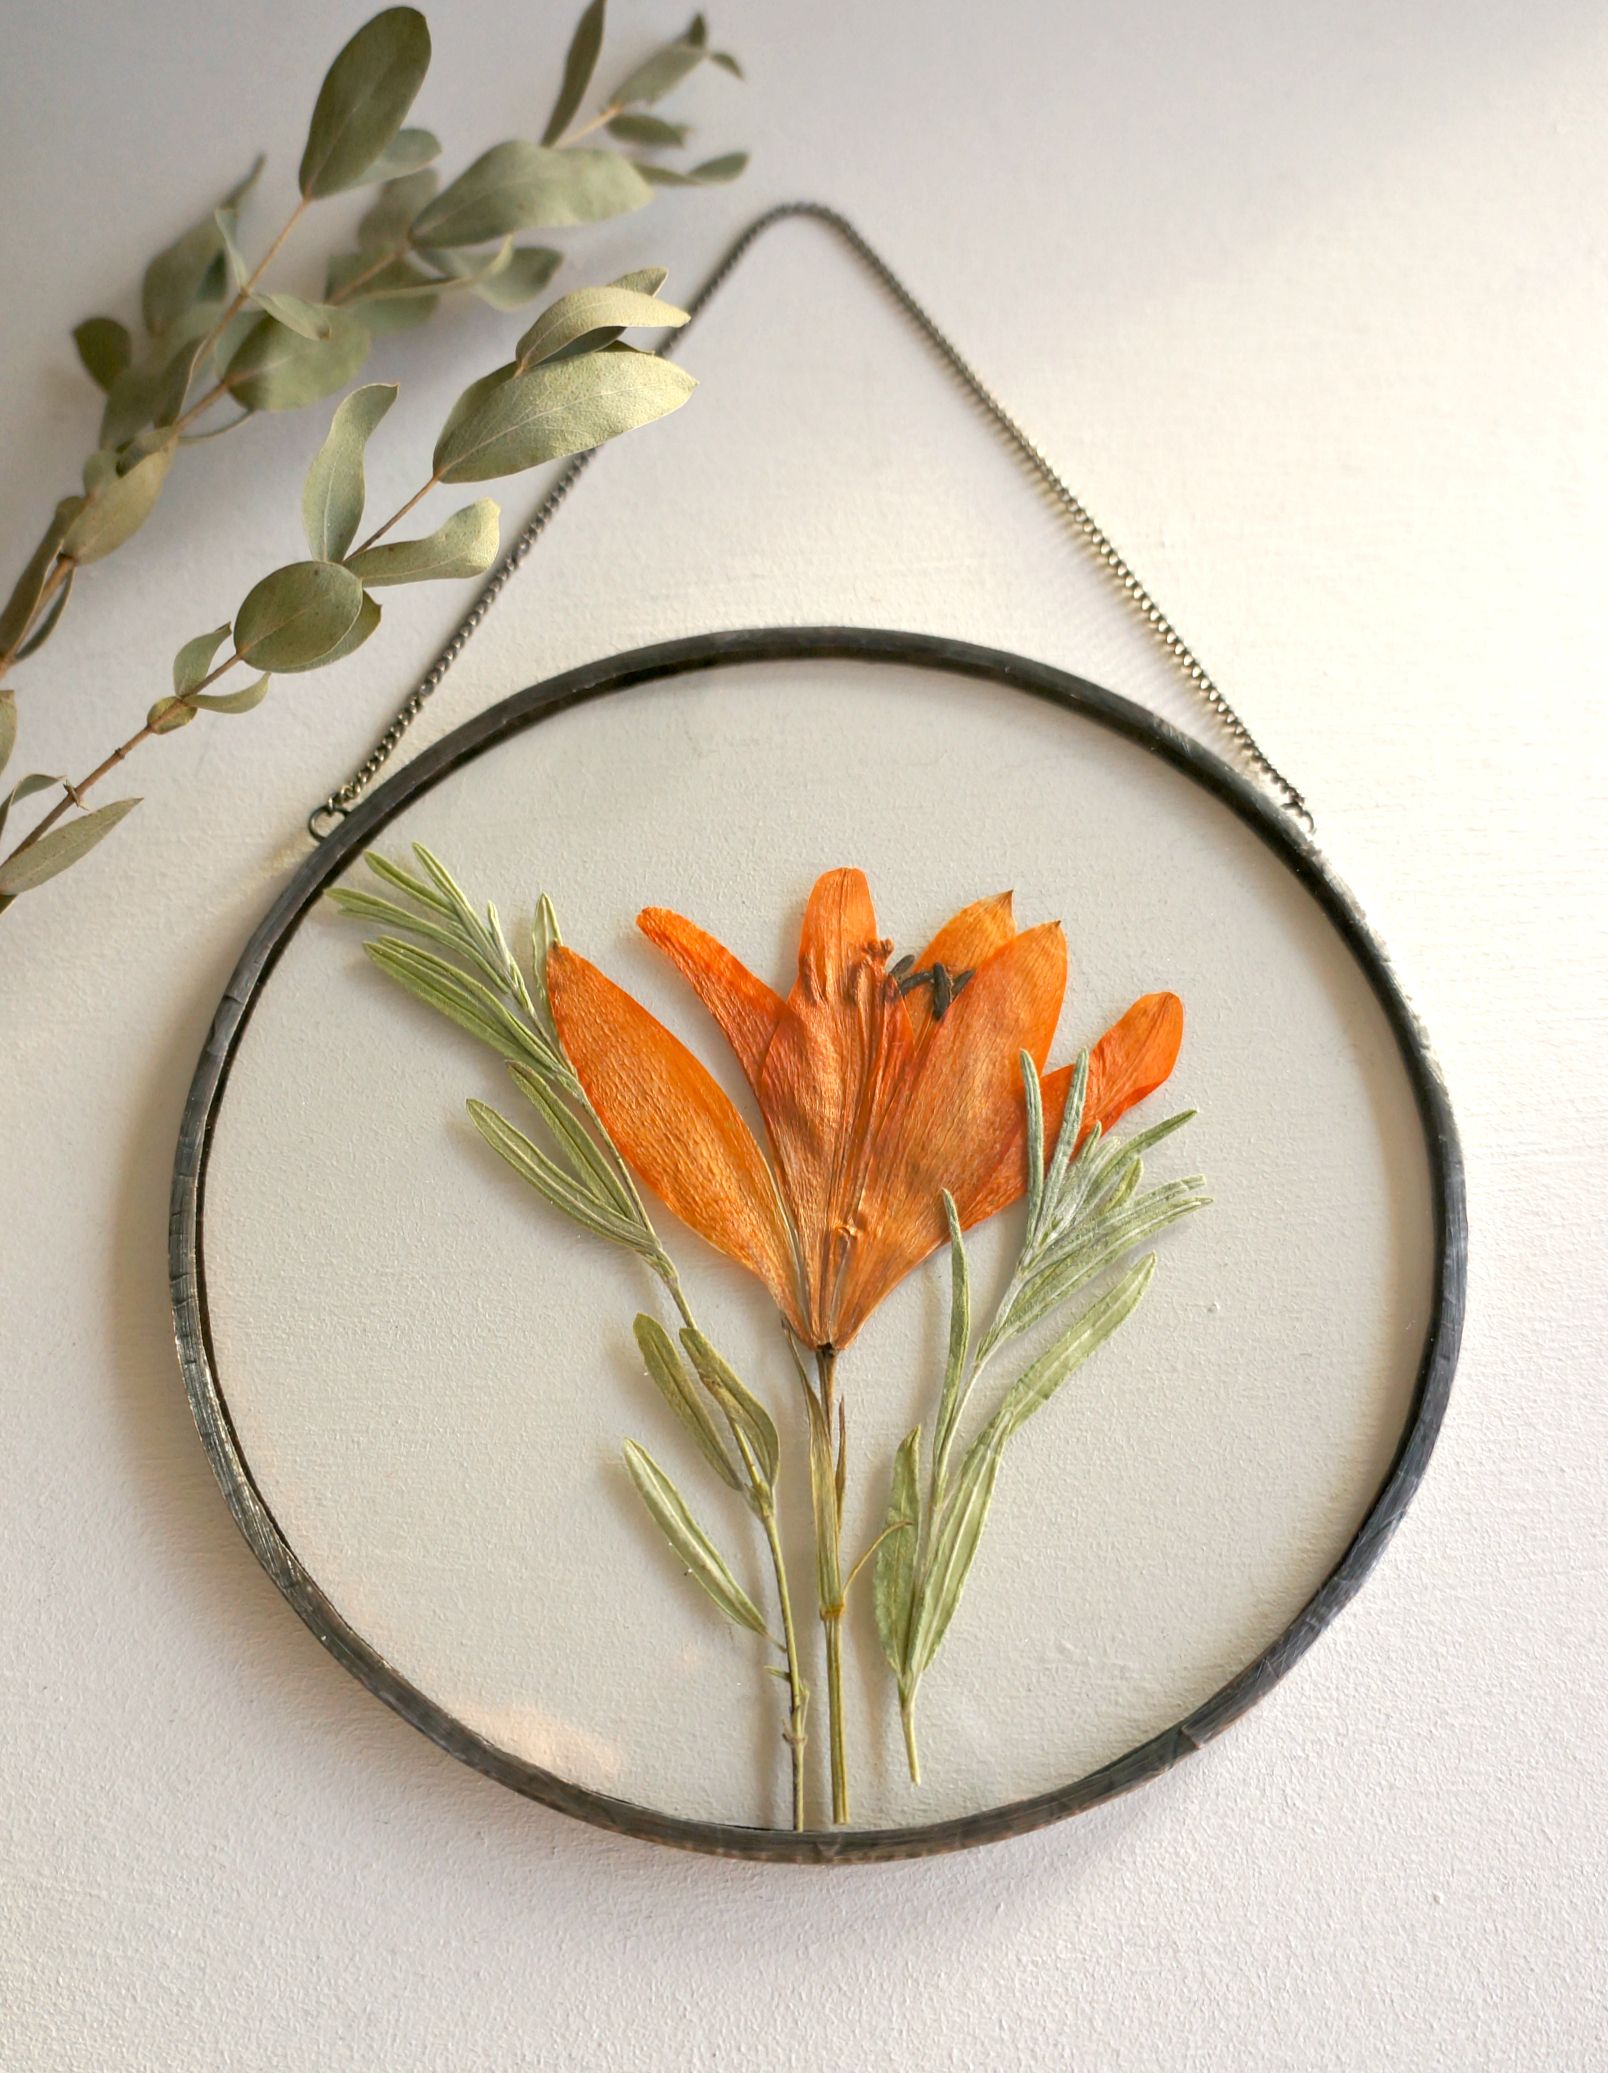 Vintage Pressed Dried Flowers In Circular Glass Frame